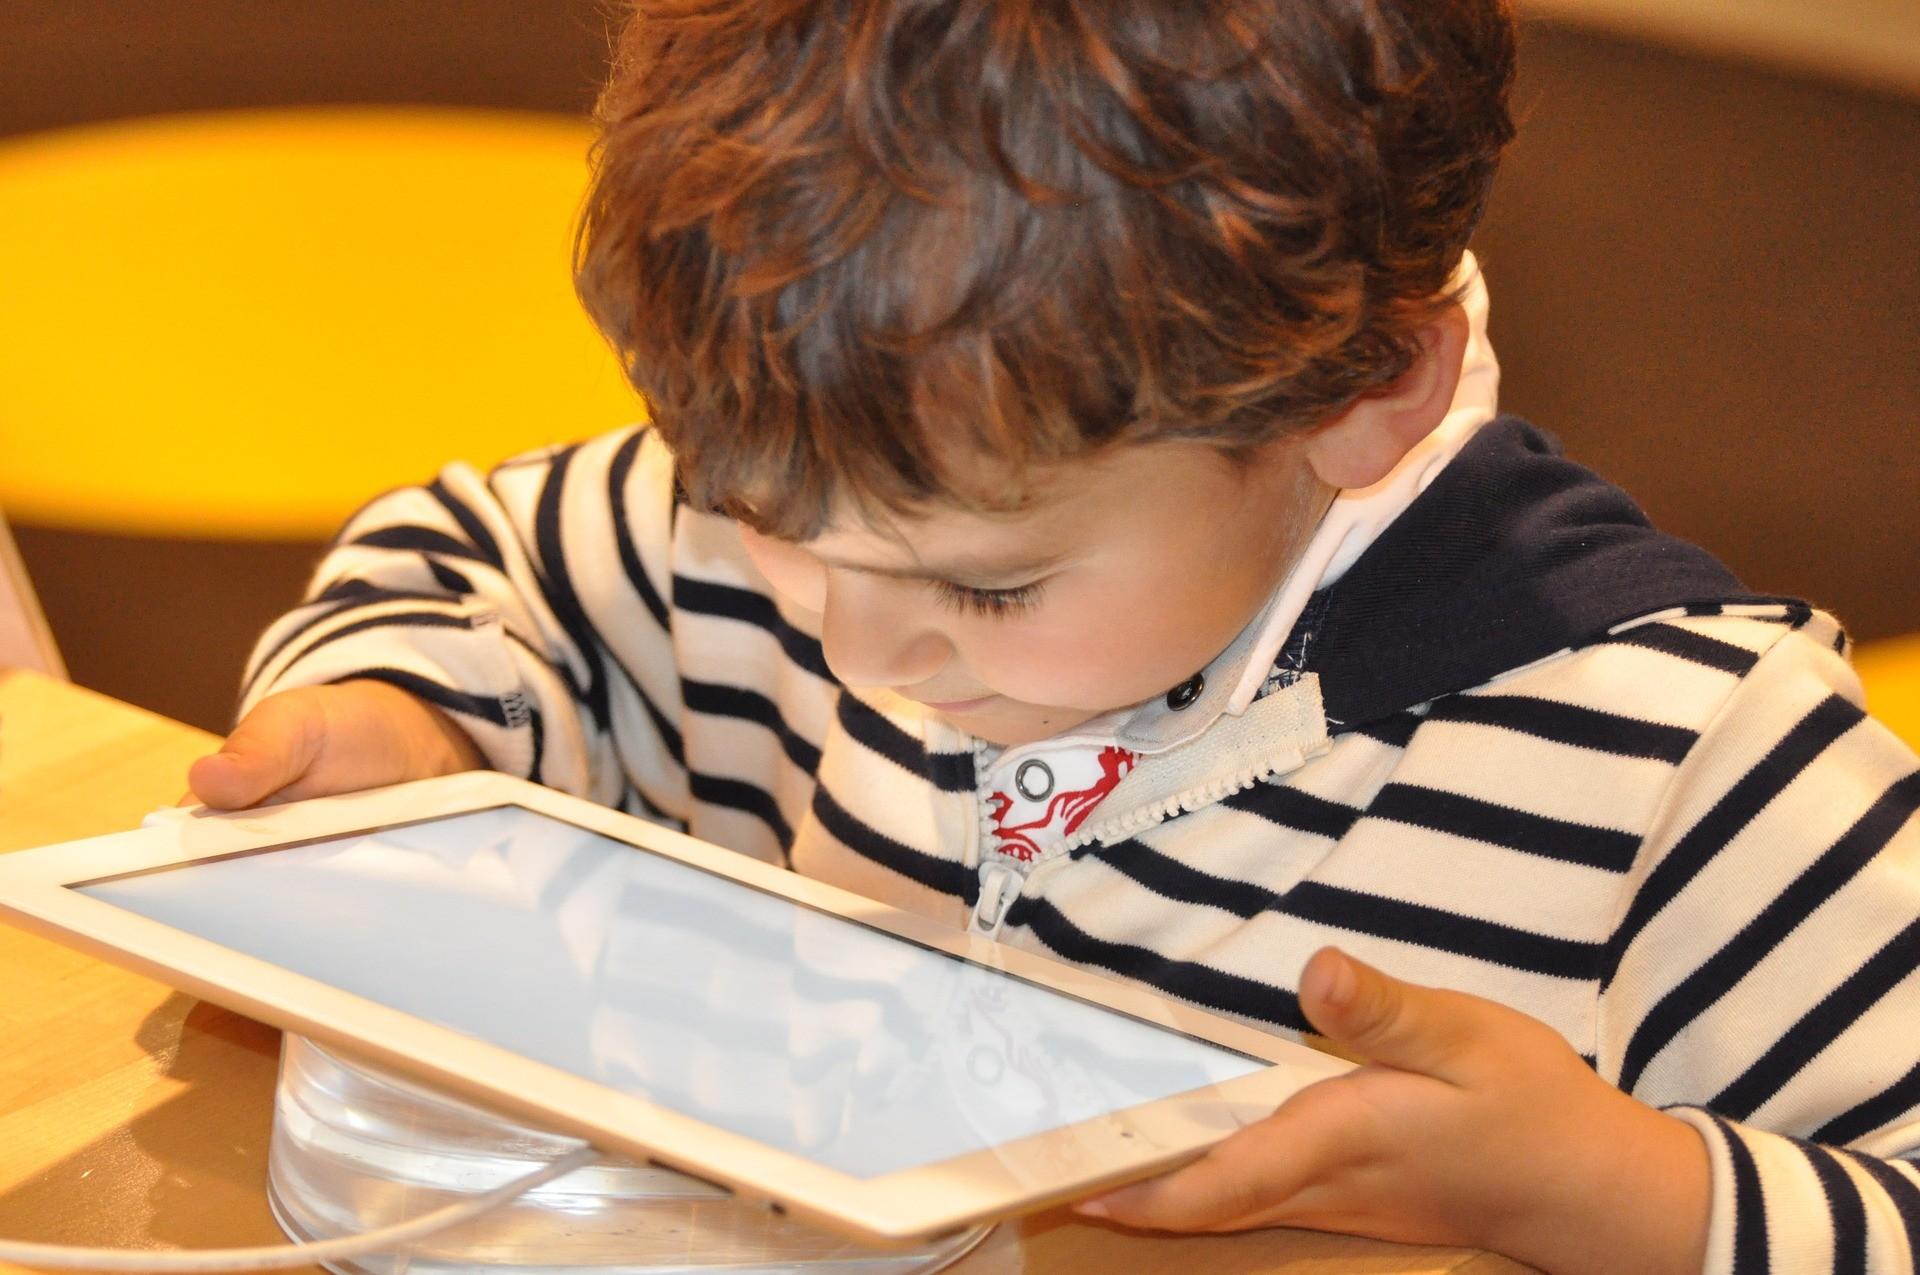 criança com ipad (Foto: Nadine Doerlé/Pixabay )